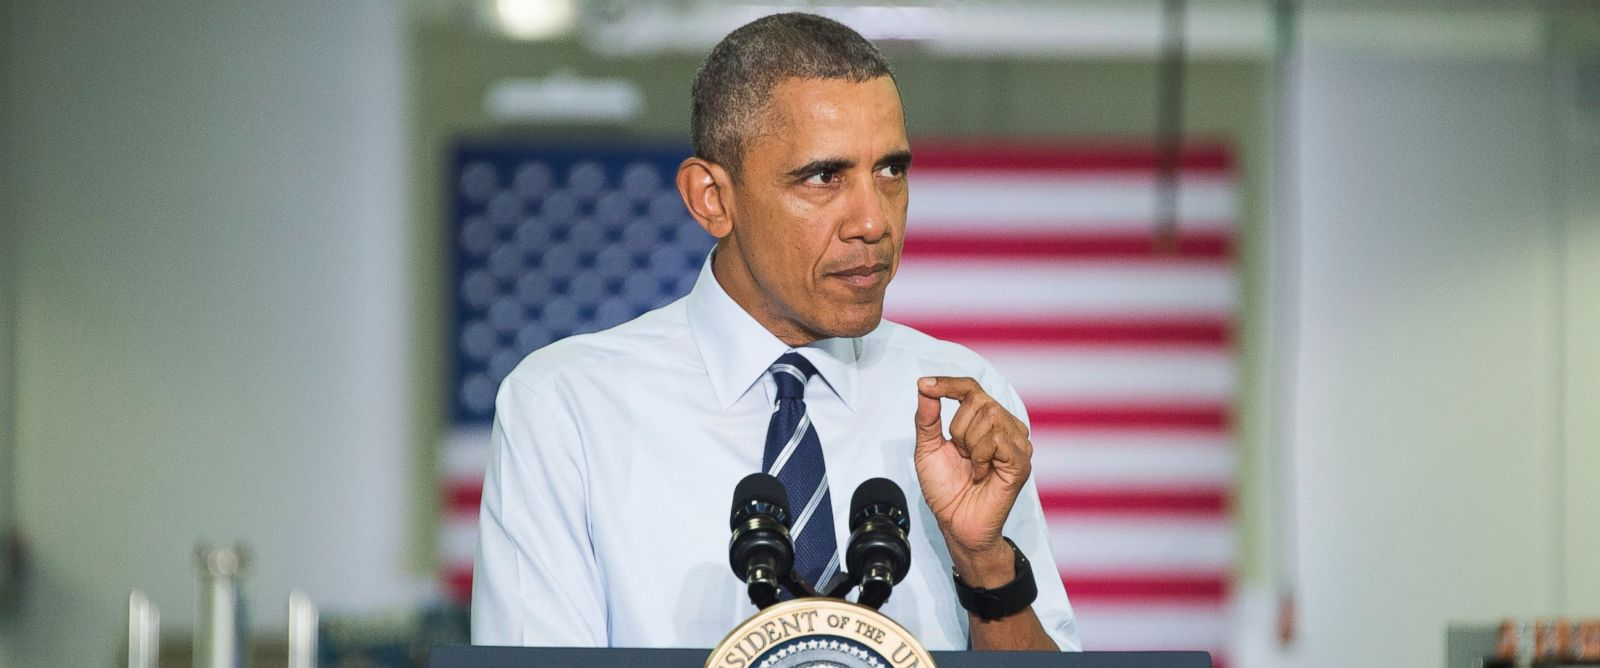 PHOTO: US President Barack Obama speaks after touring Saft America Advanced Batteries Plant in Jacksonville, Florida Feb. 26, 2016.